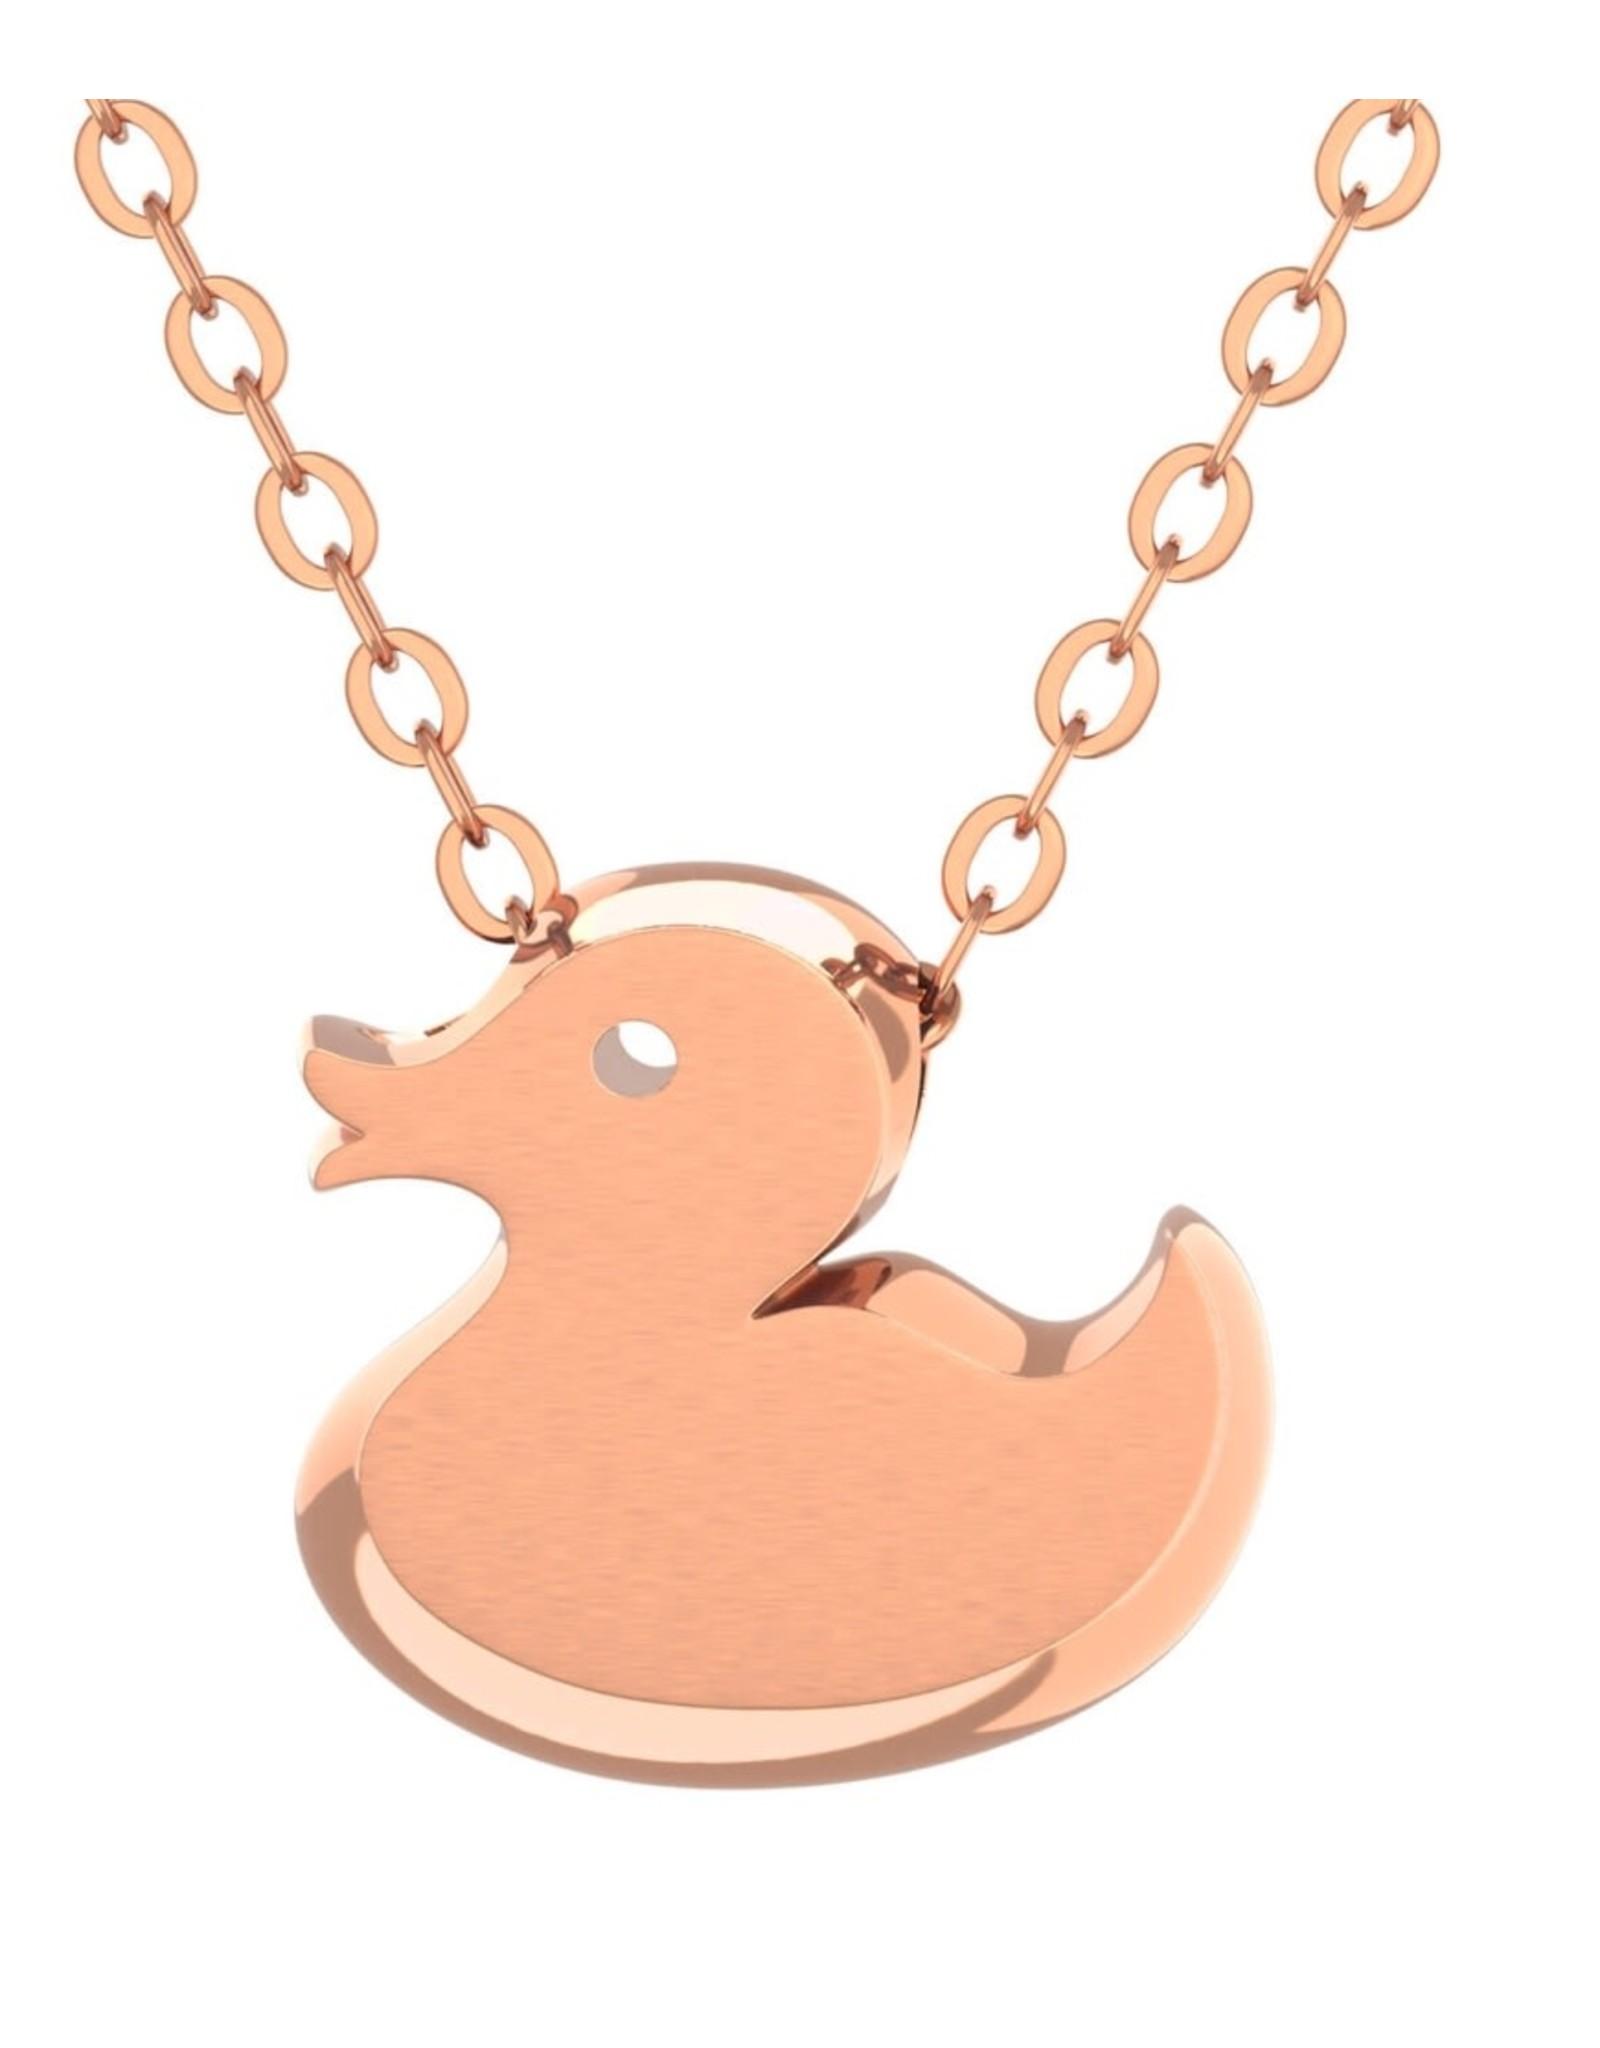 Rubber Duck Pendant & Chain - Rose Gold